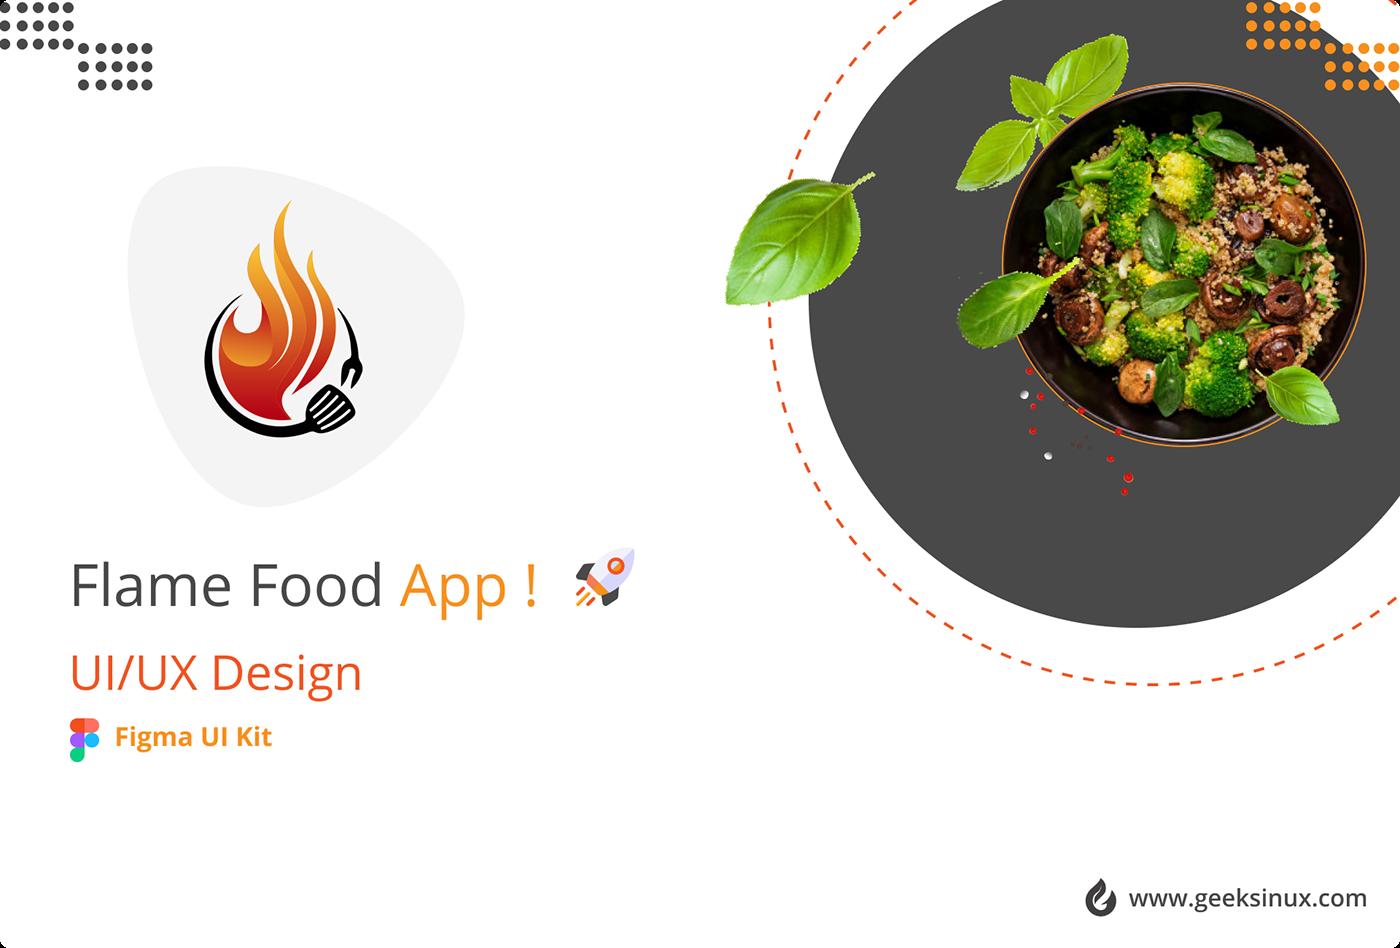 Flame food app flame food App case study food app case study food app ui kit food delivery app Food ui kit geeksinux Interaction design  Muhammad Nawaz Rizvi uiux